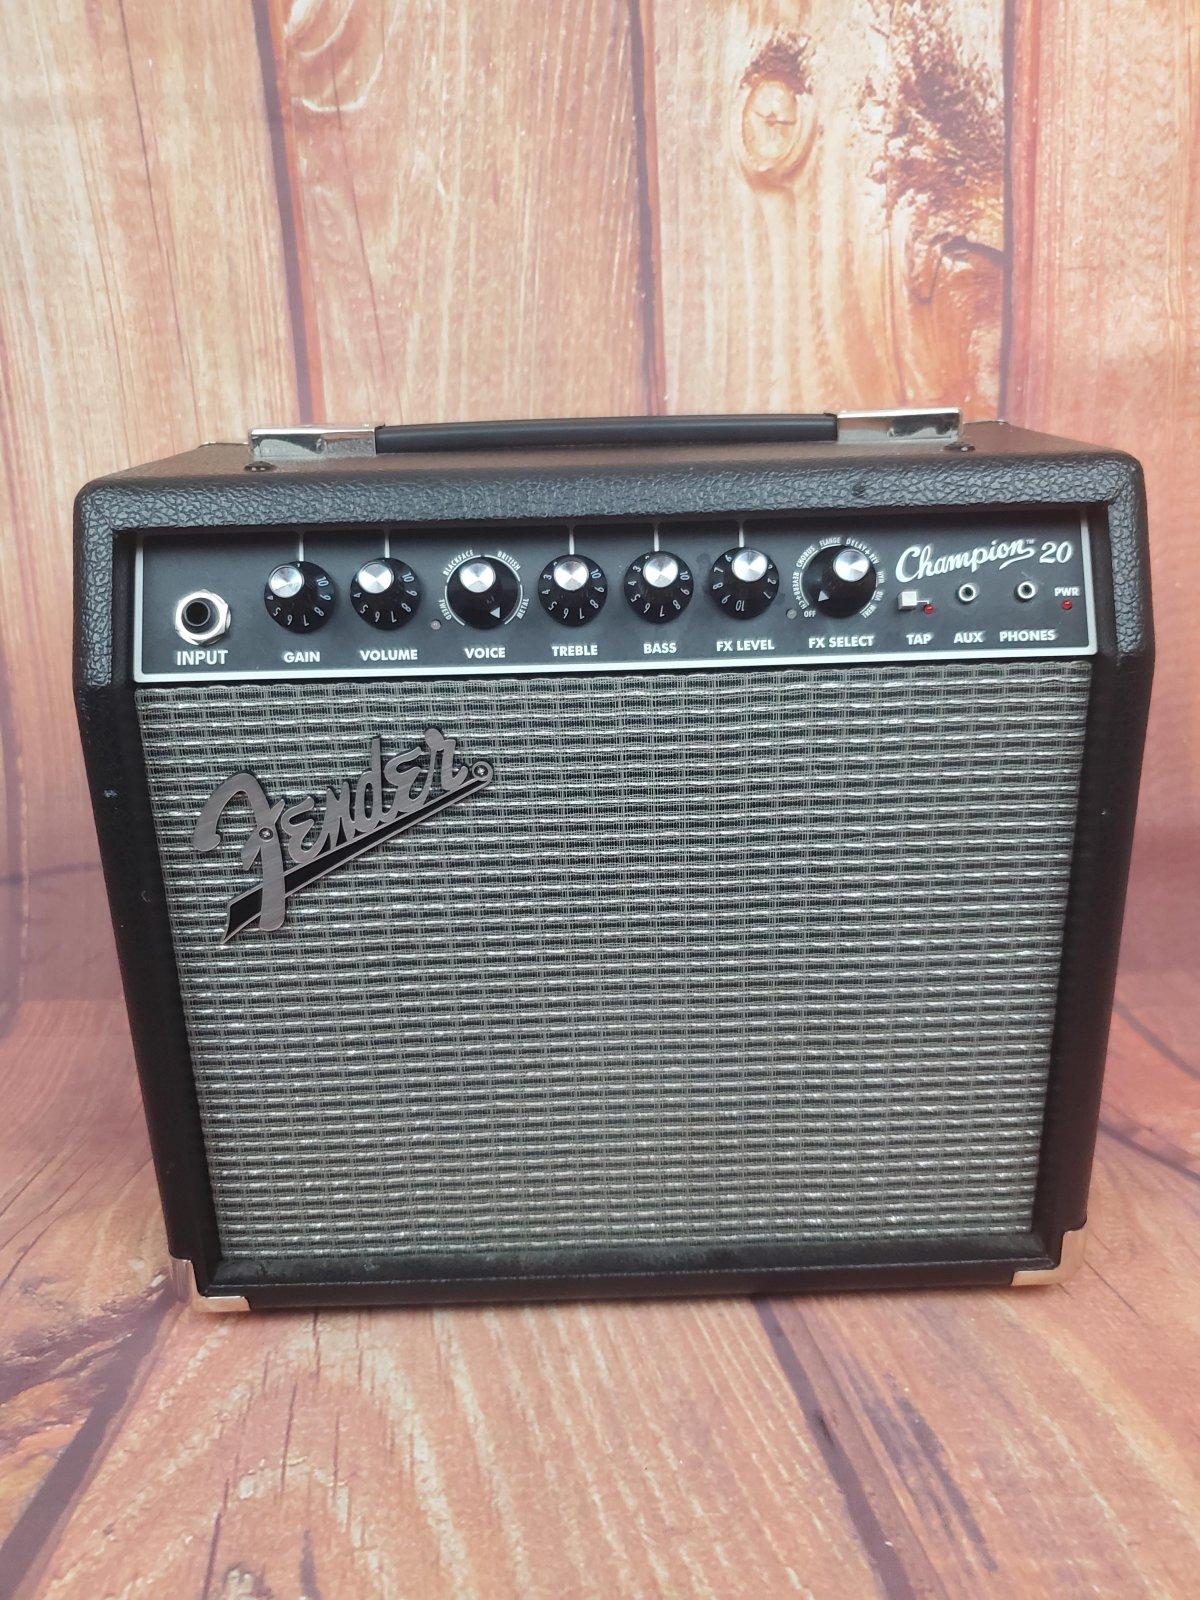 Used-Fender Champion 20 Guitar Amp